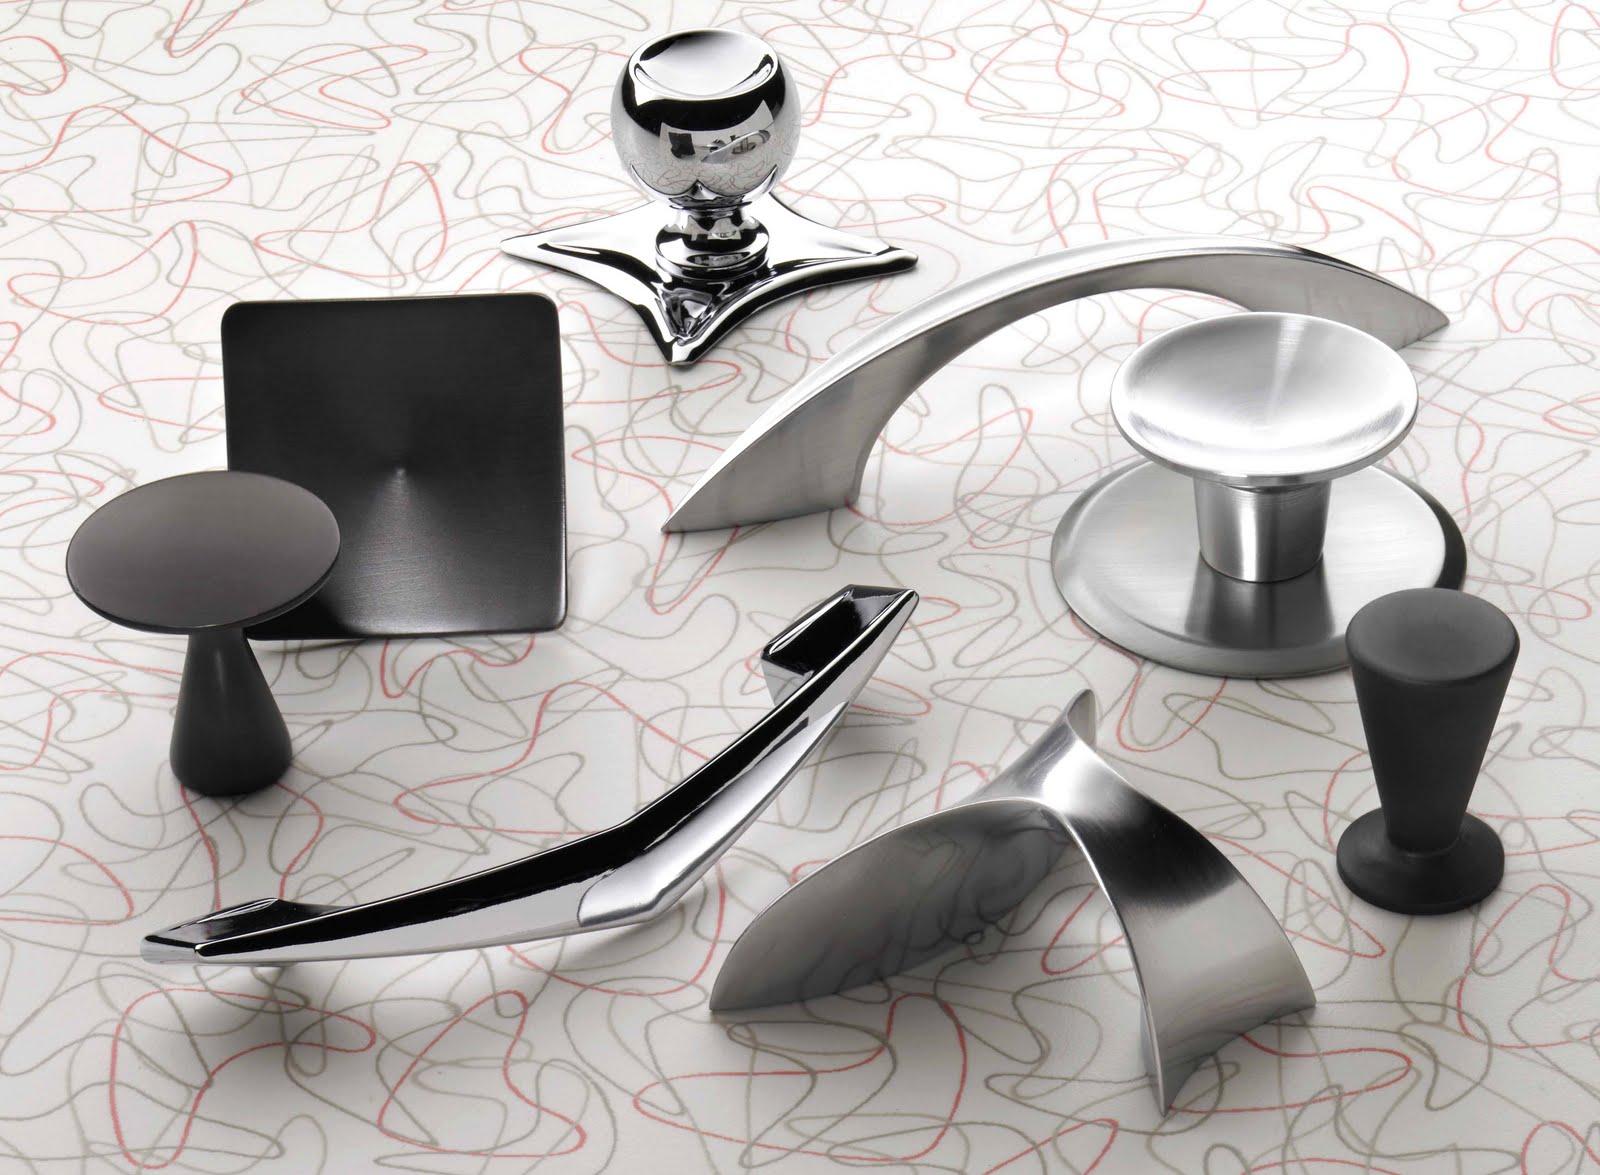 Kitchen Handles And Pulls Designer Mad For Mid Century November 2010